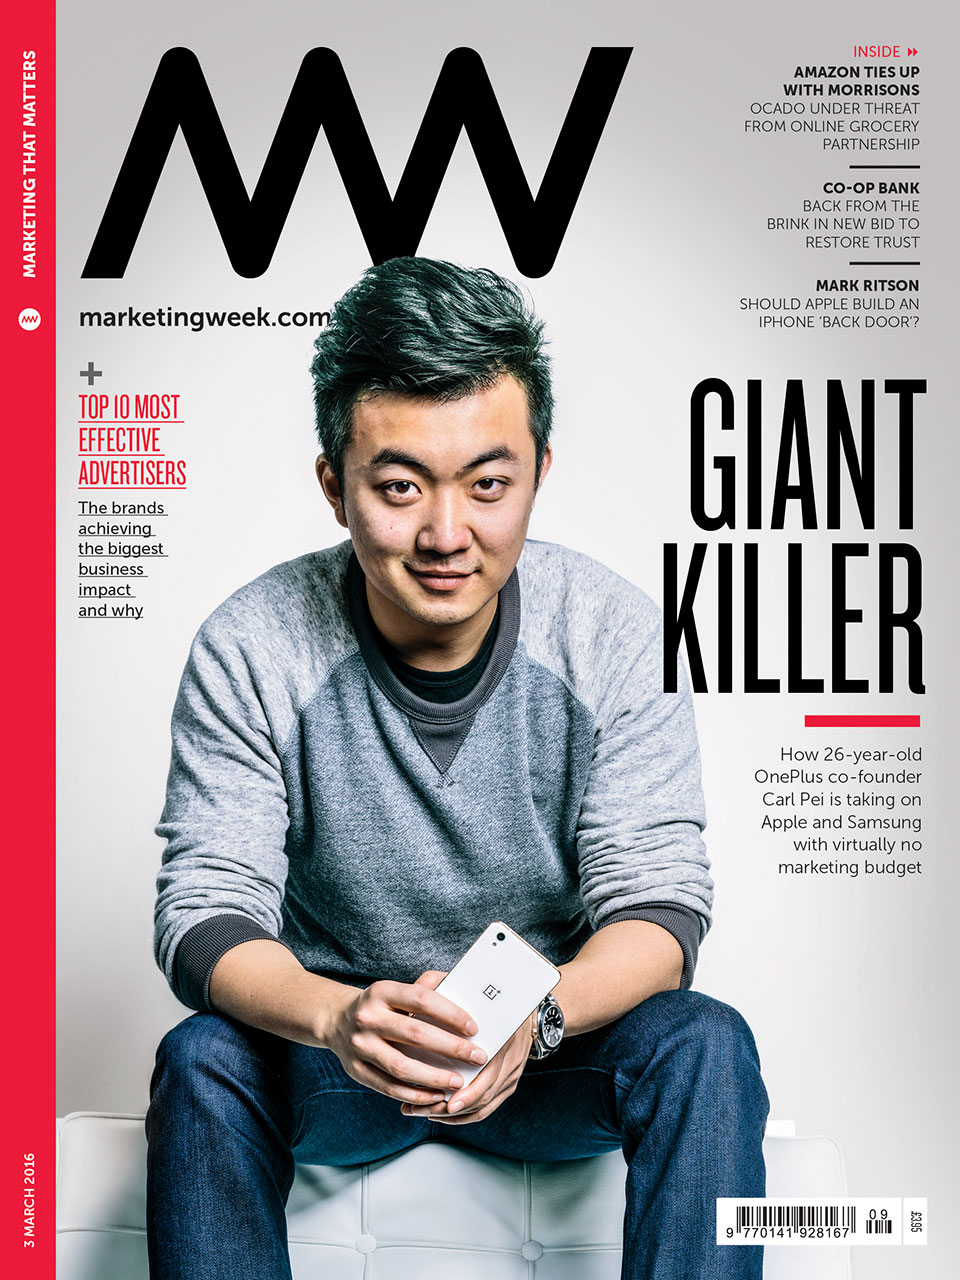 OnePlus co-founder Carl Pei Portrait